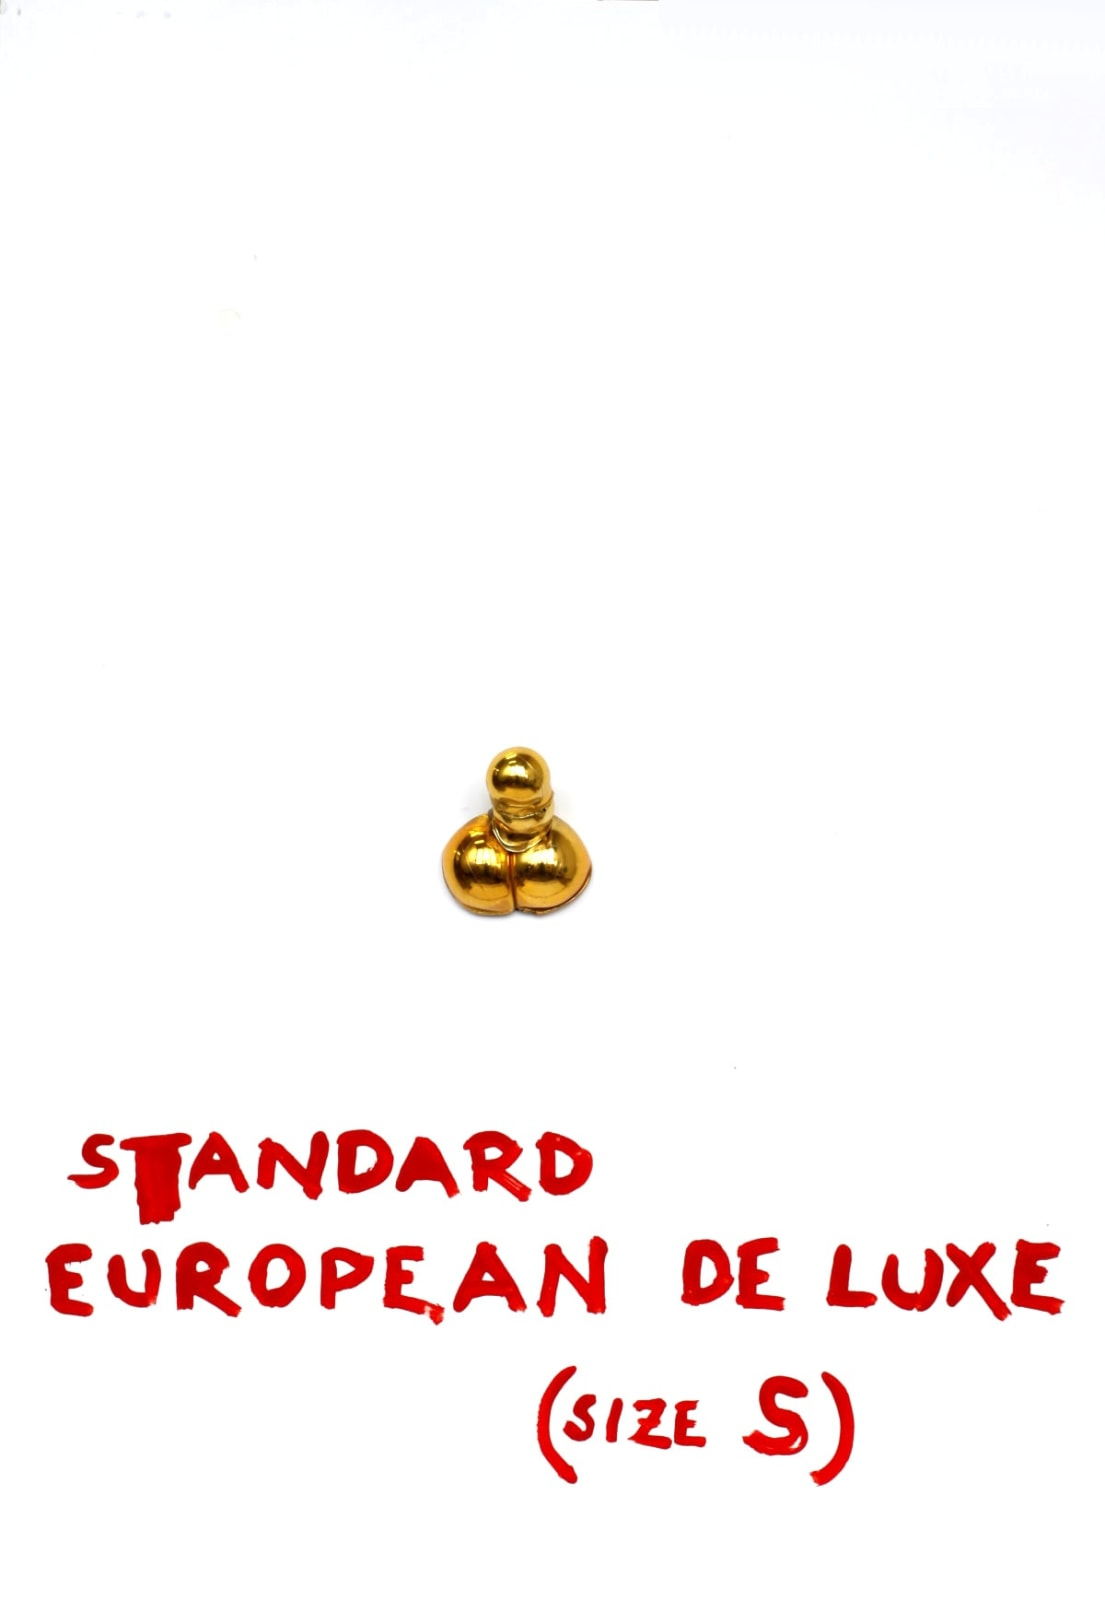 Krištof Kintera, Standard european de luxe size s, 2018